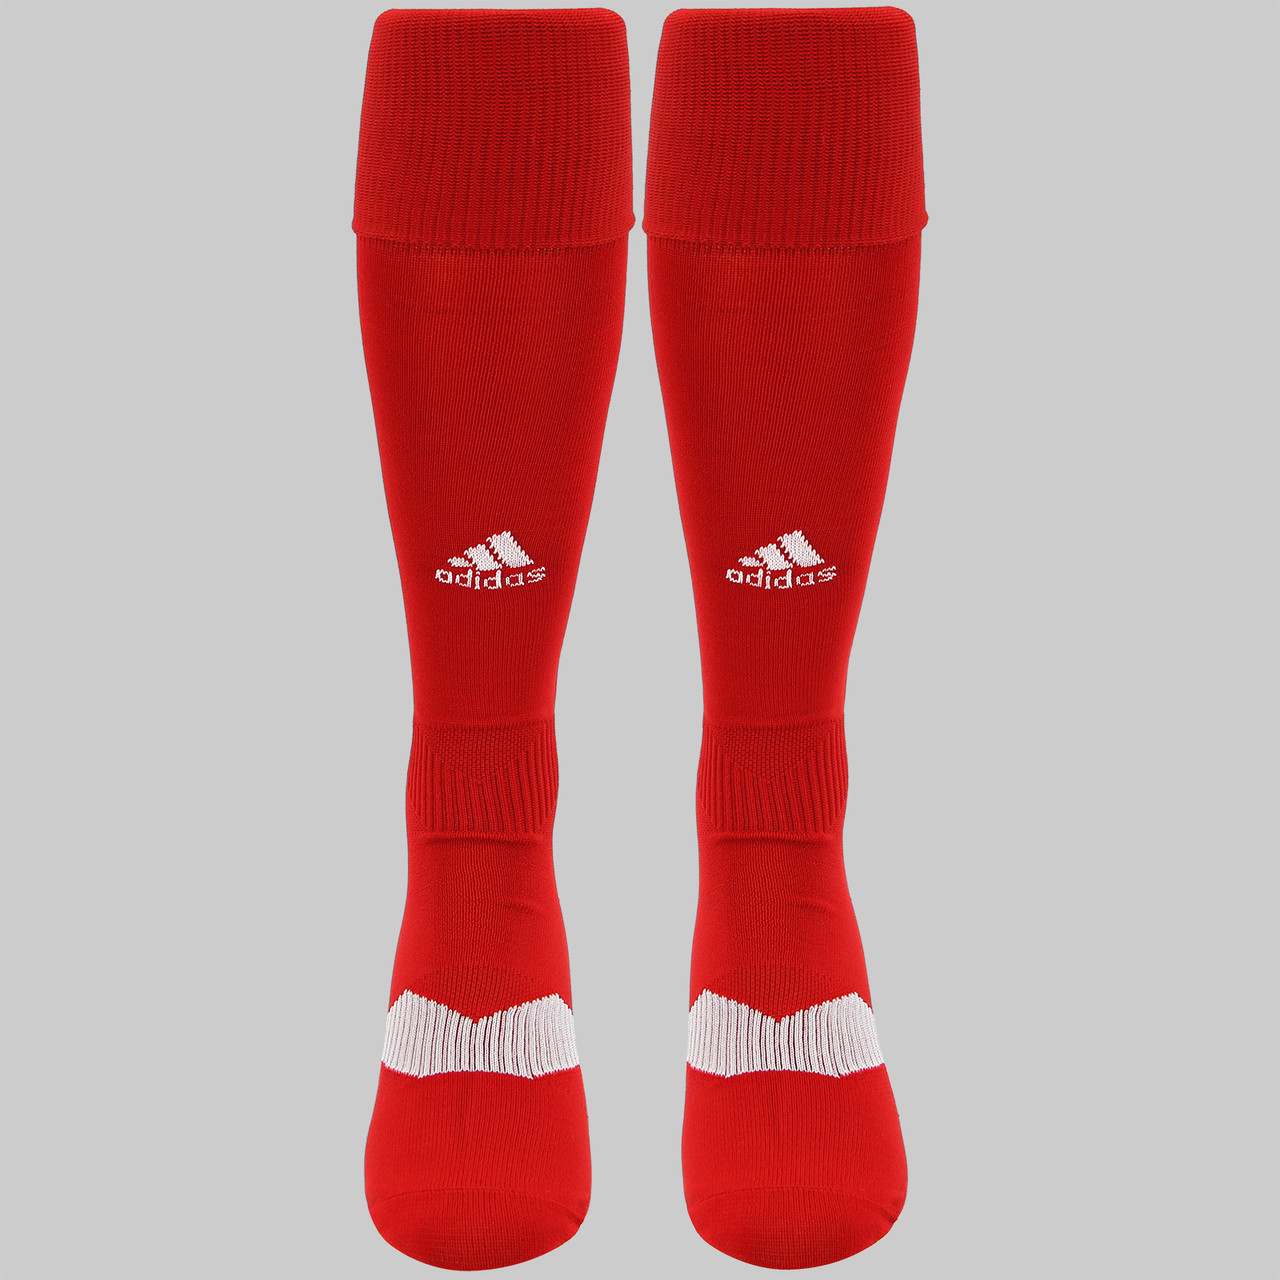 86d3e746a ... Adidas Metro IV OTC Soccer Socks - Power Red, White, Clear Grey ...